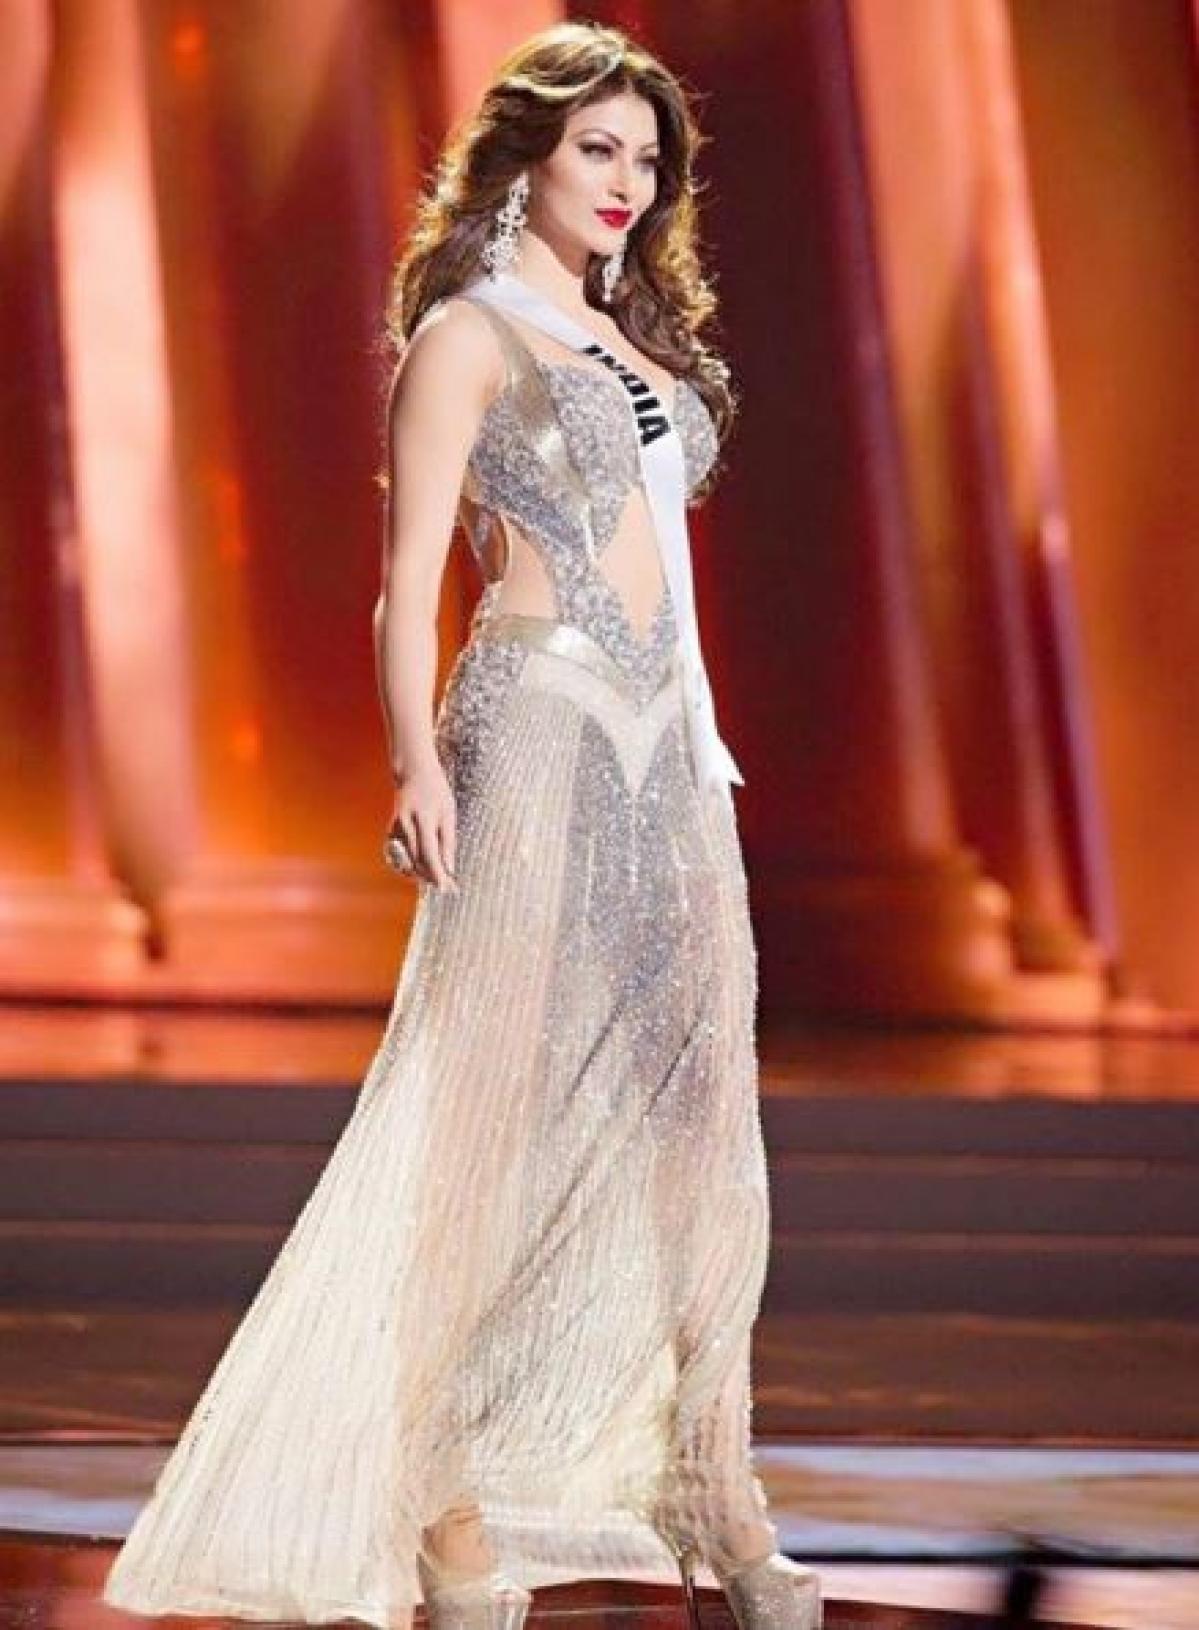 In Photos: Urvashi Rautela\'s Best Looks Miss Universe 2015 - The Quint